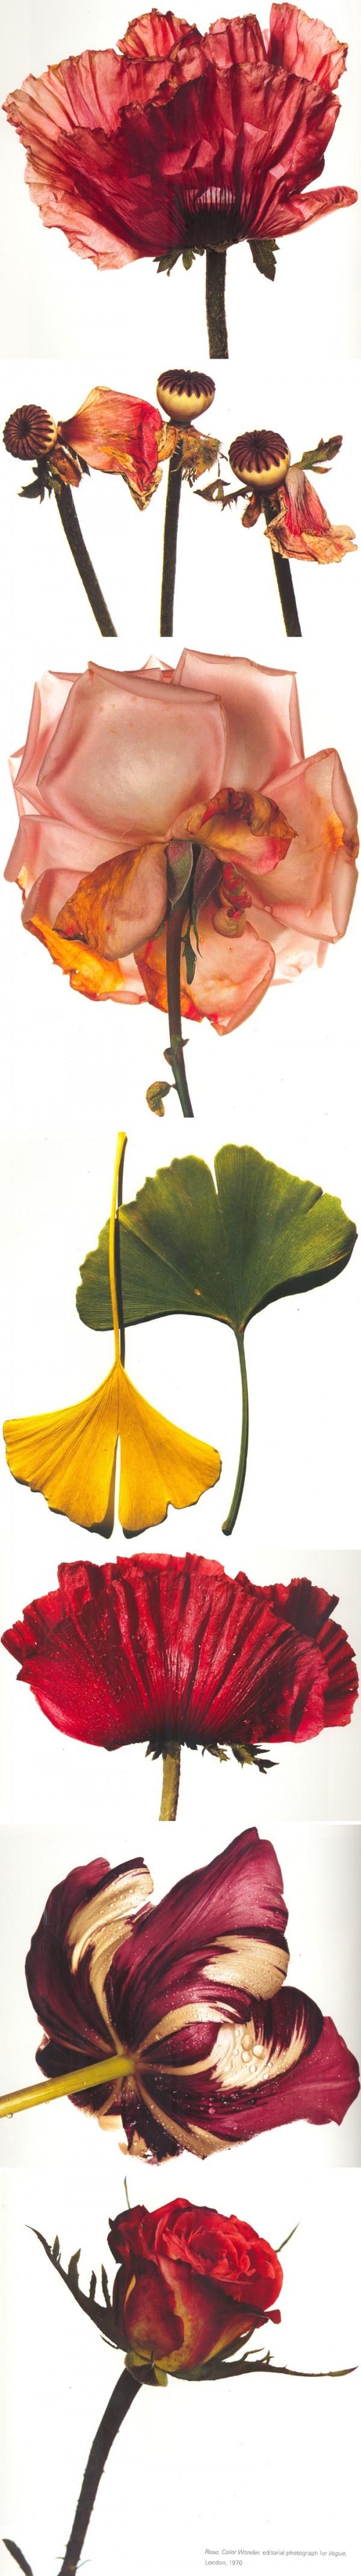 "Image Spark - Image tagged ""irving penn"", ""flores"", ""flower"" - mailirolponi"